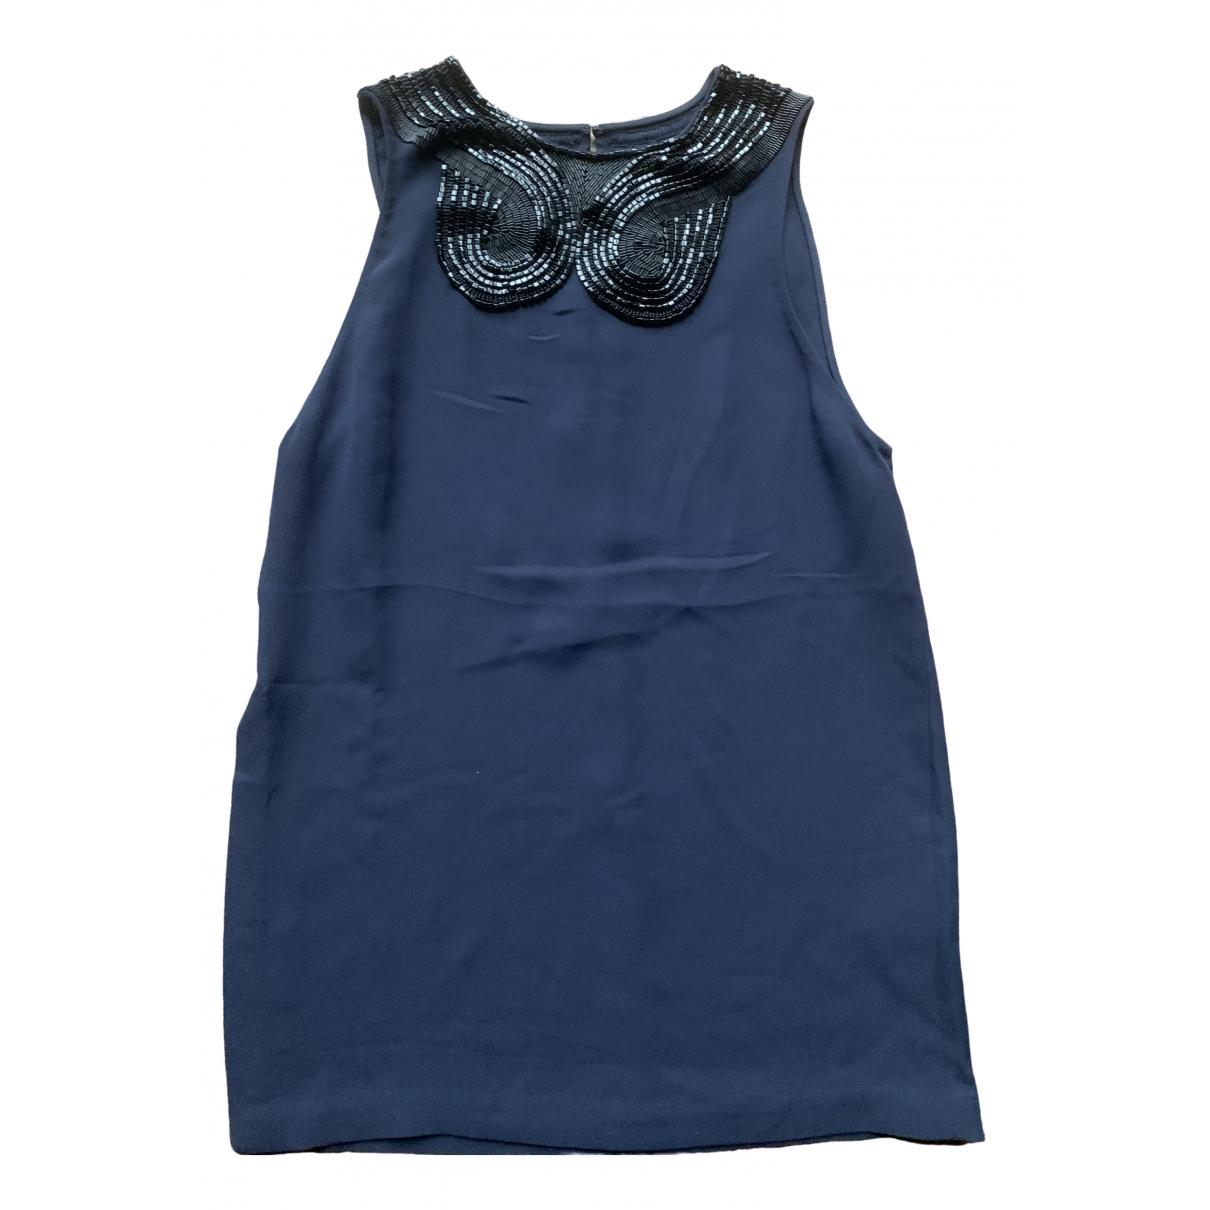 3.1 Phillip Lim \N Blue Silk  top for Women S International